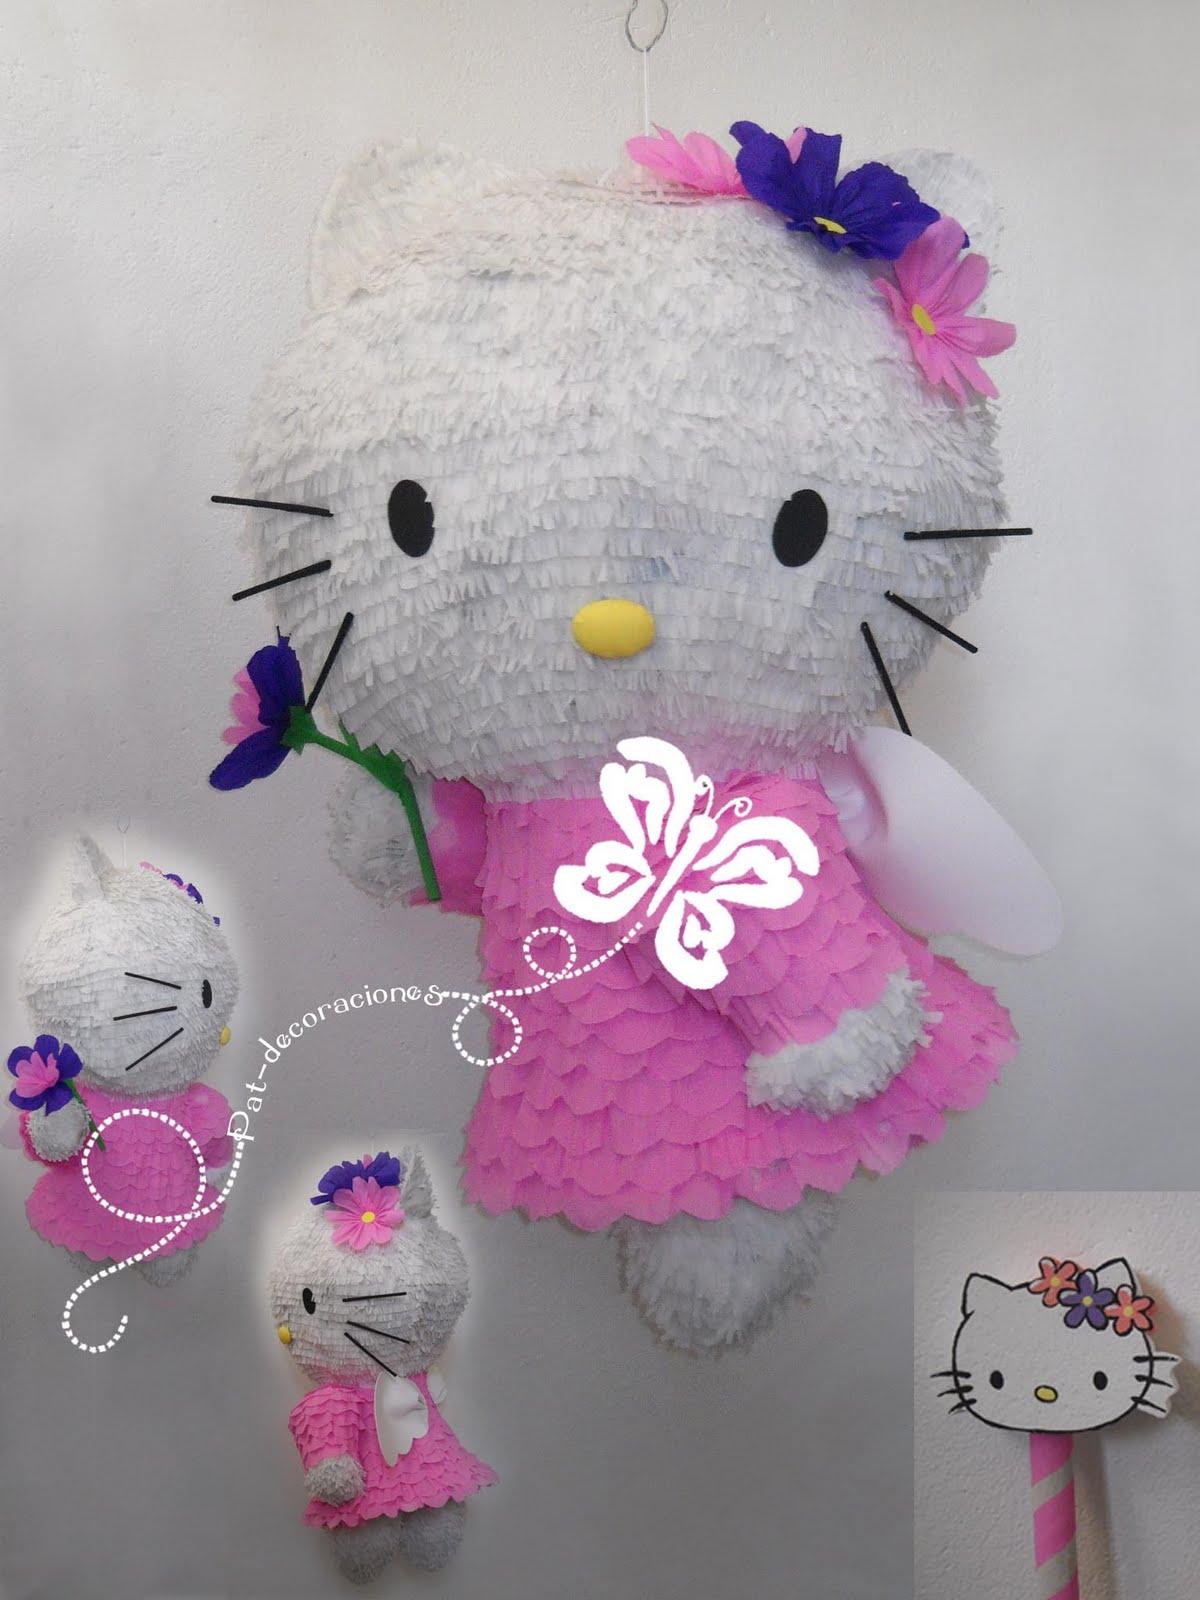 Pat decoraciones hello kitty - Decoracion hello kitty ...